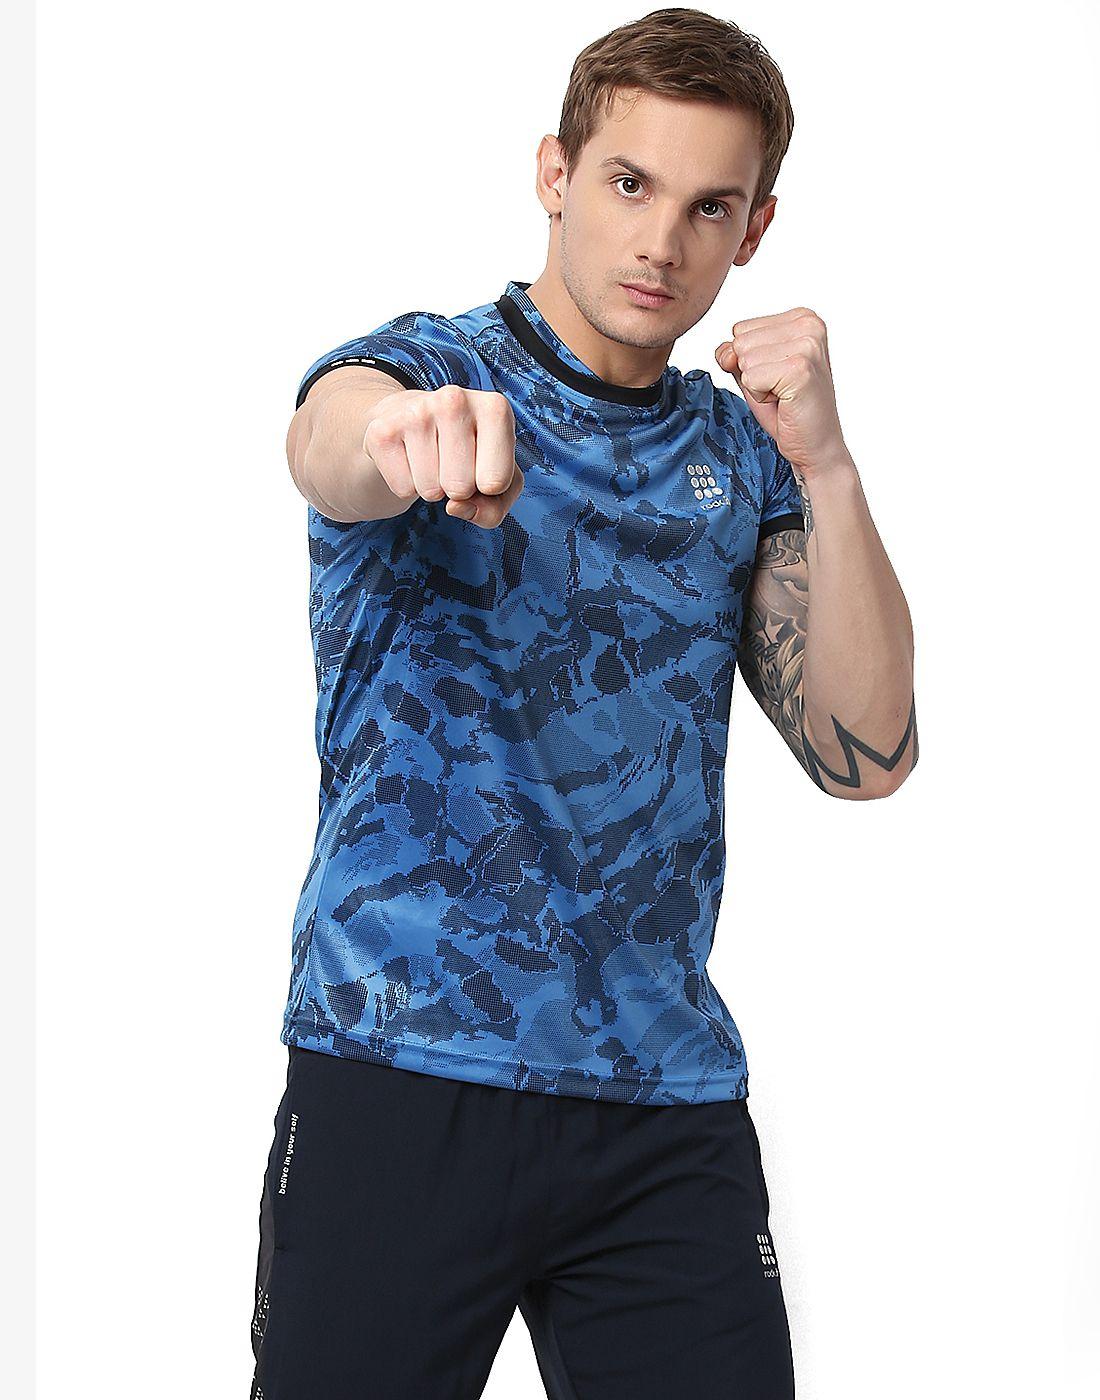 Rock.it Blue Polyester T-Shirt